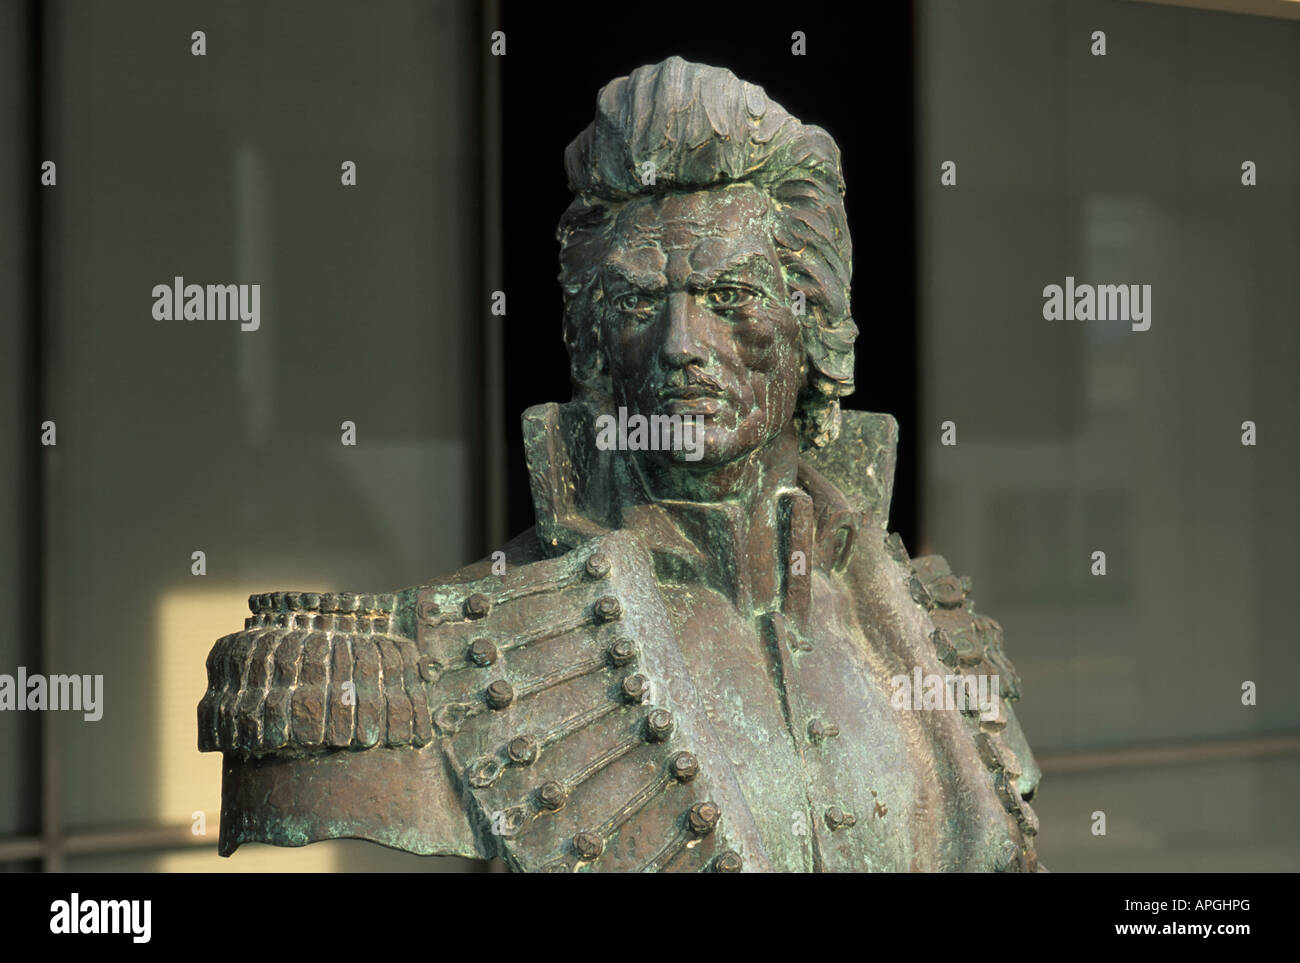 Bust of Casimir Pulaski, a Polish military commander and American Revolutionary War hero, in Little Rock Arkansas Stock Photo